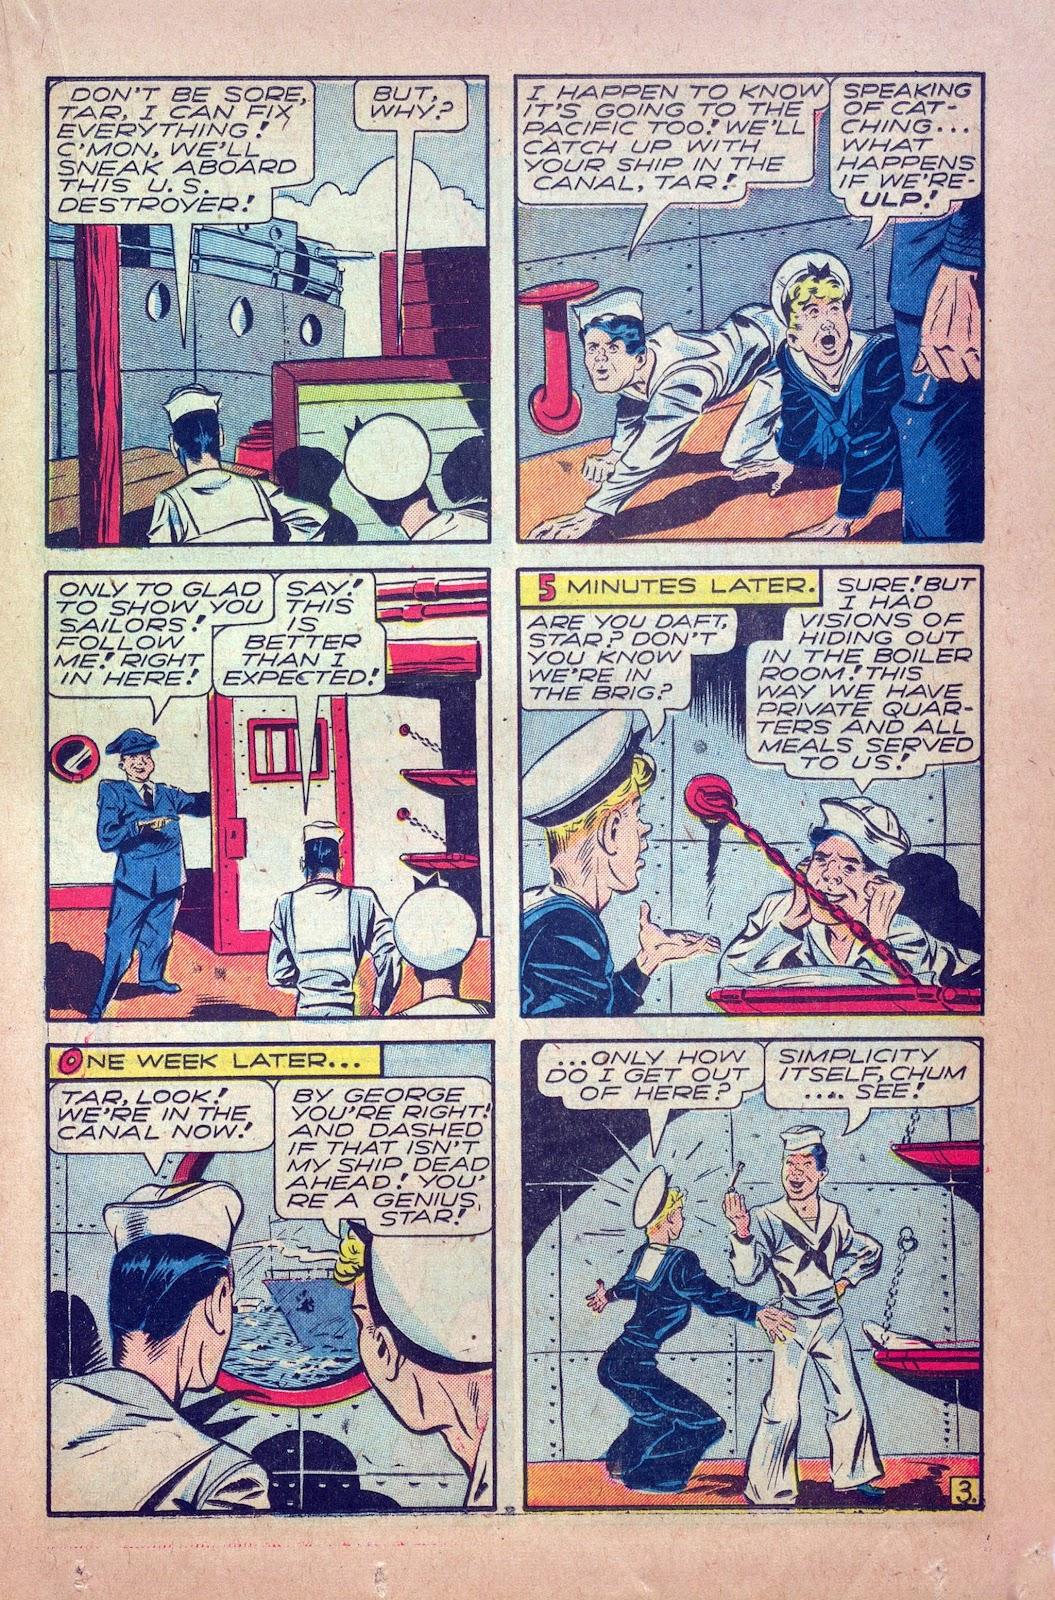 Read online Joker Comics comic -  Issue #17 - 29